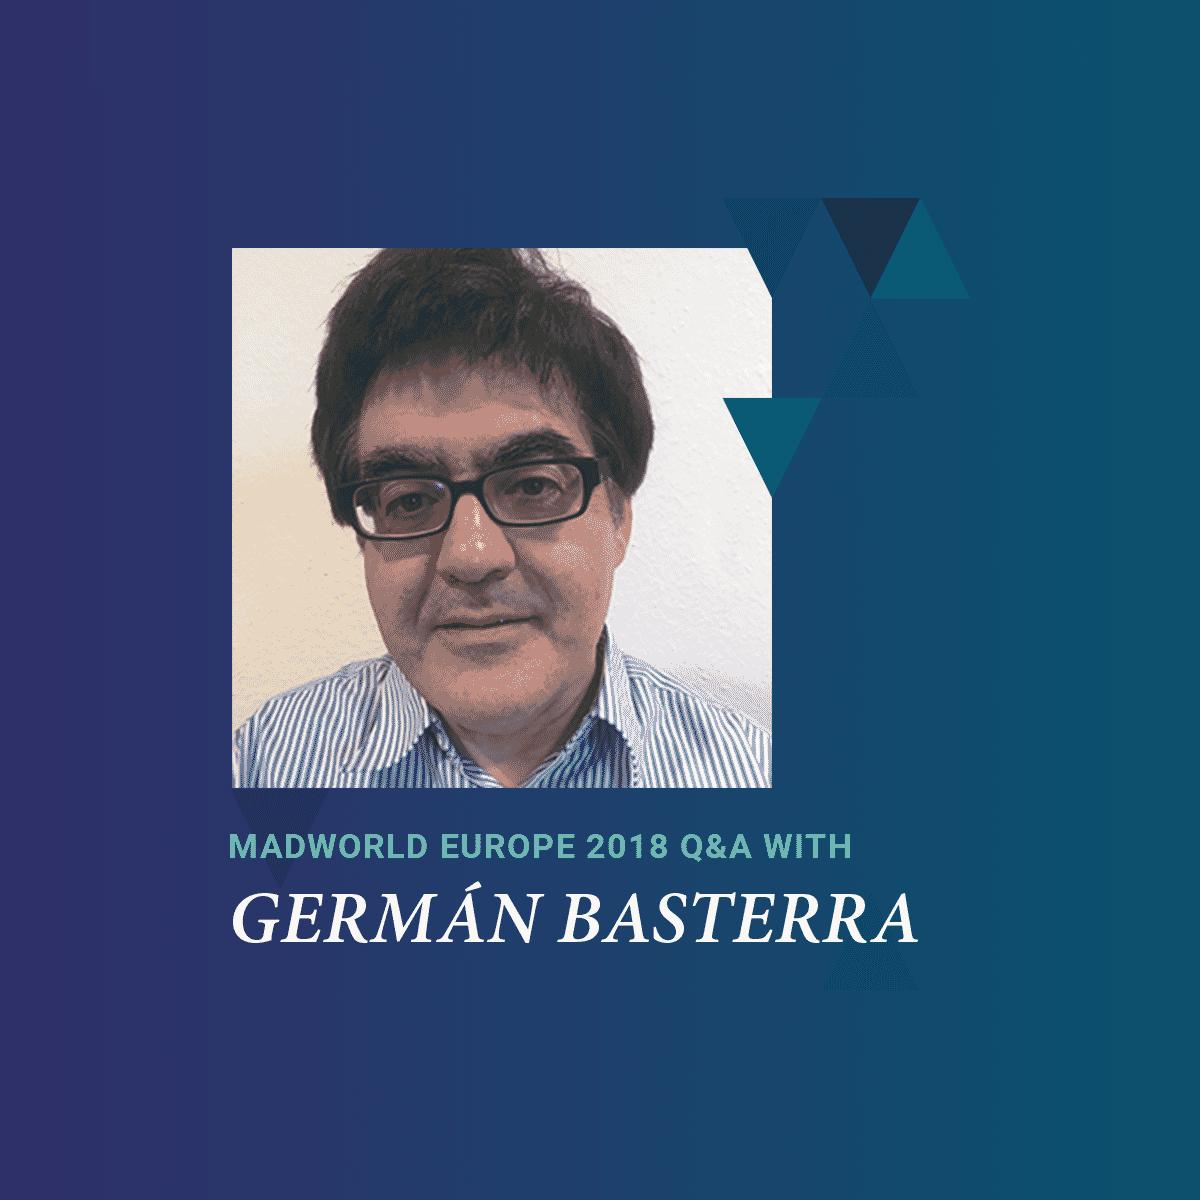 MadWorld 2018 Europe Speaker German Basterra